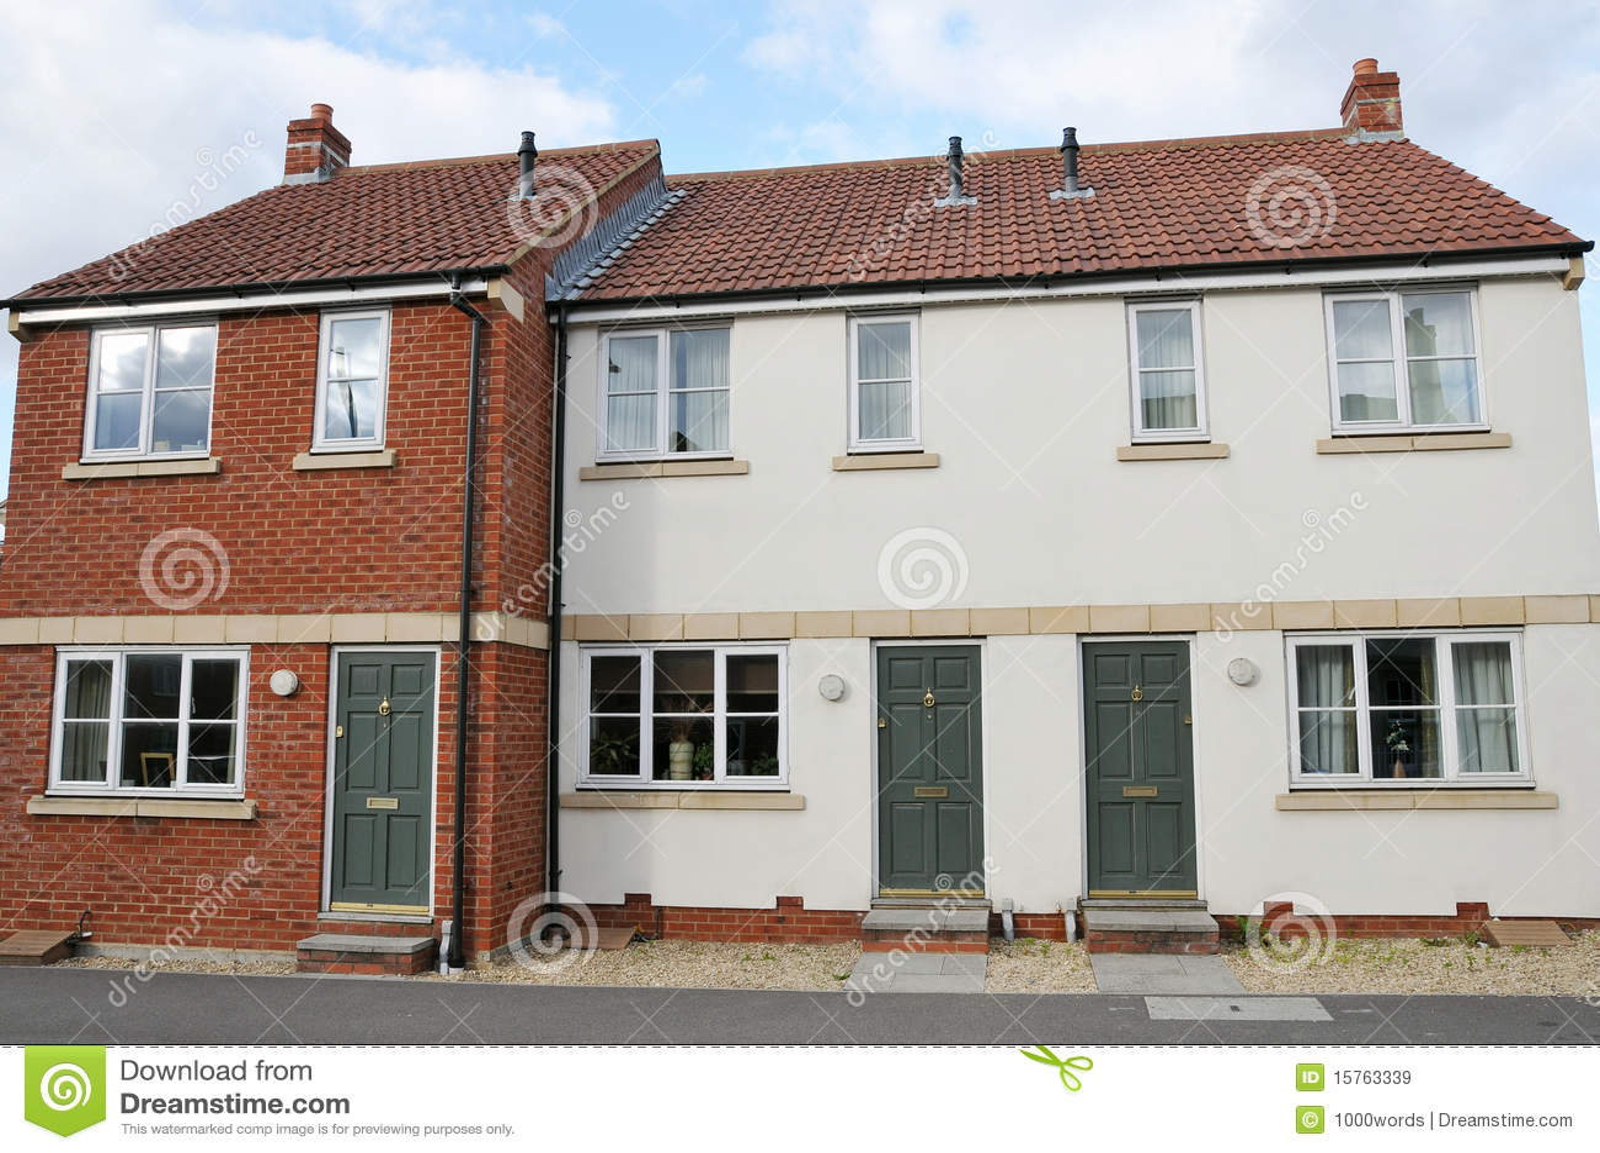 Camere a terrazze moderne immagine stock. Immagine di architettura ...